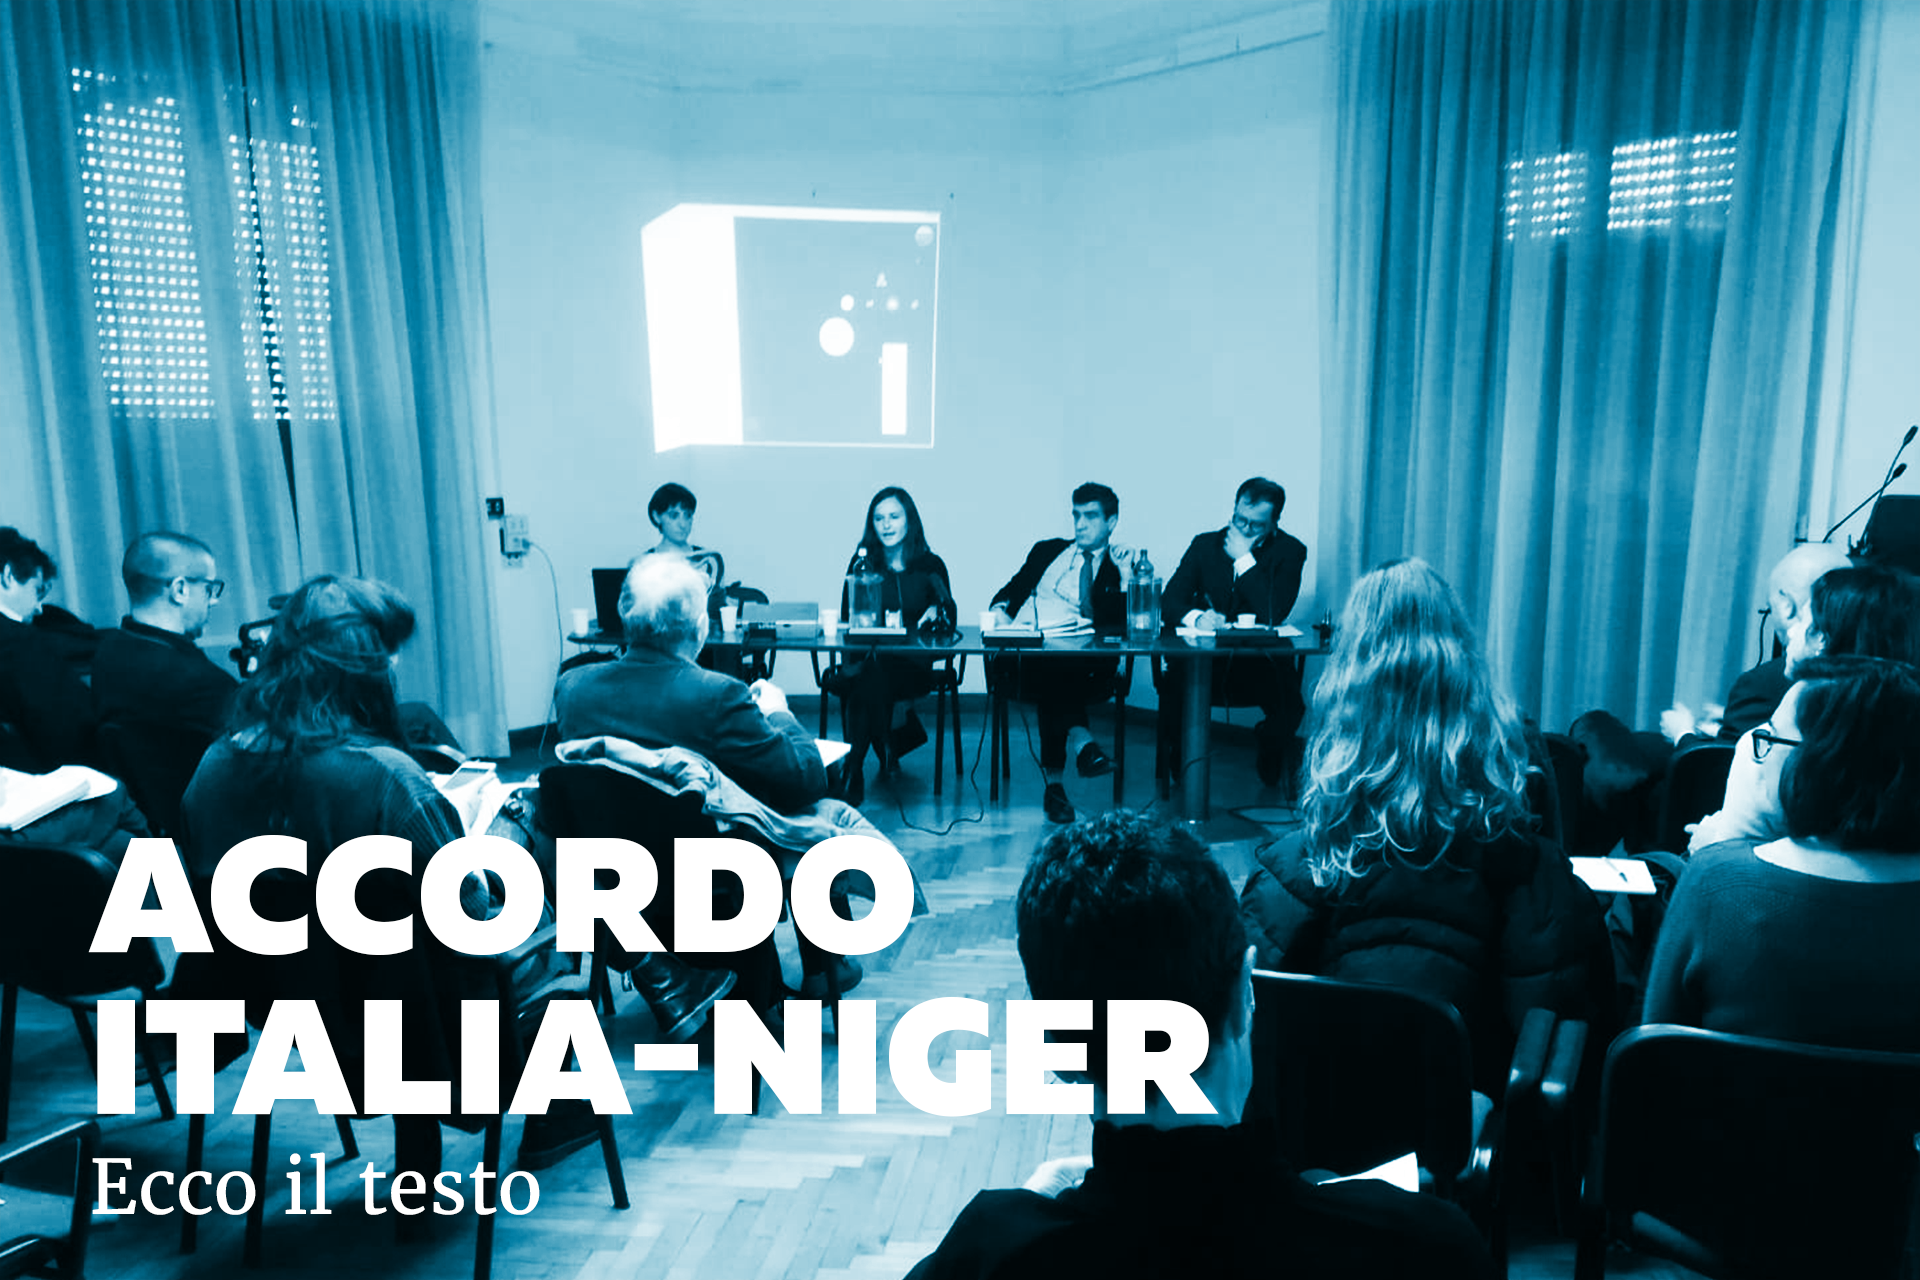 Accordo Italia-Niger